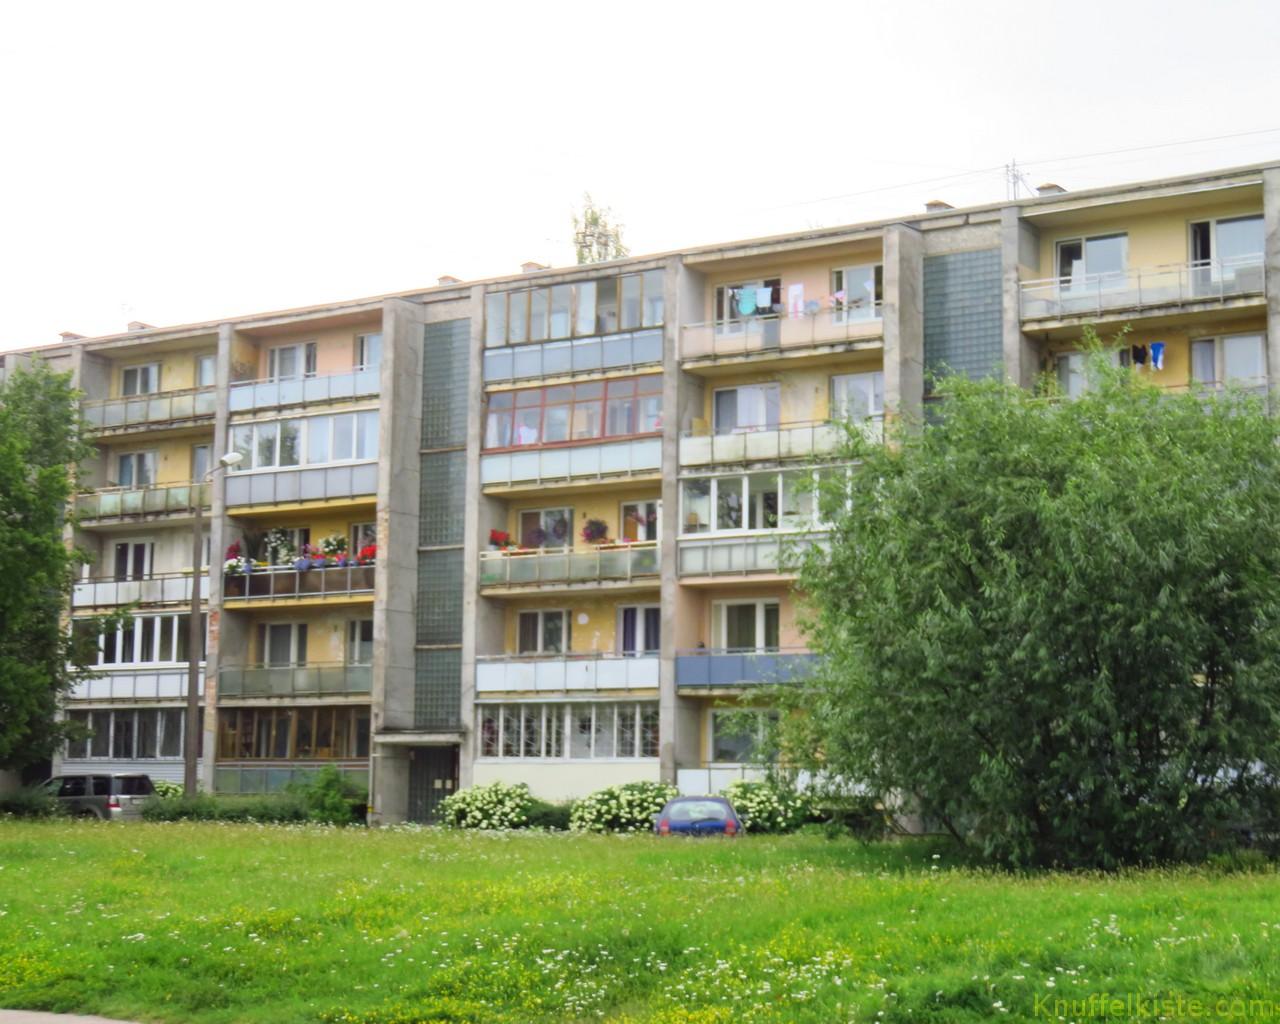 Siedlungen am Stadtrand in Riga!